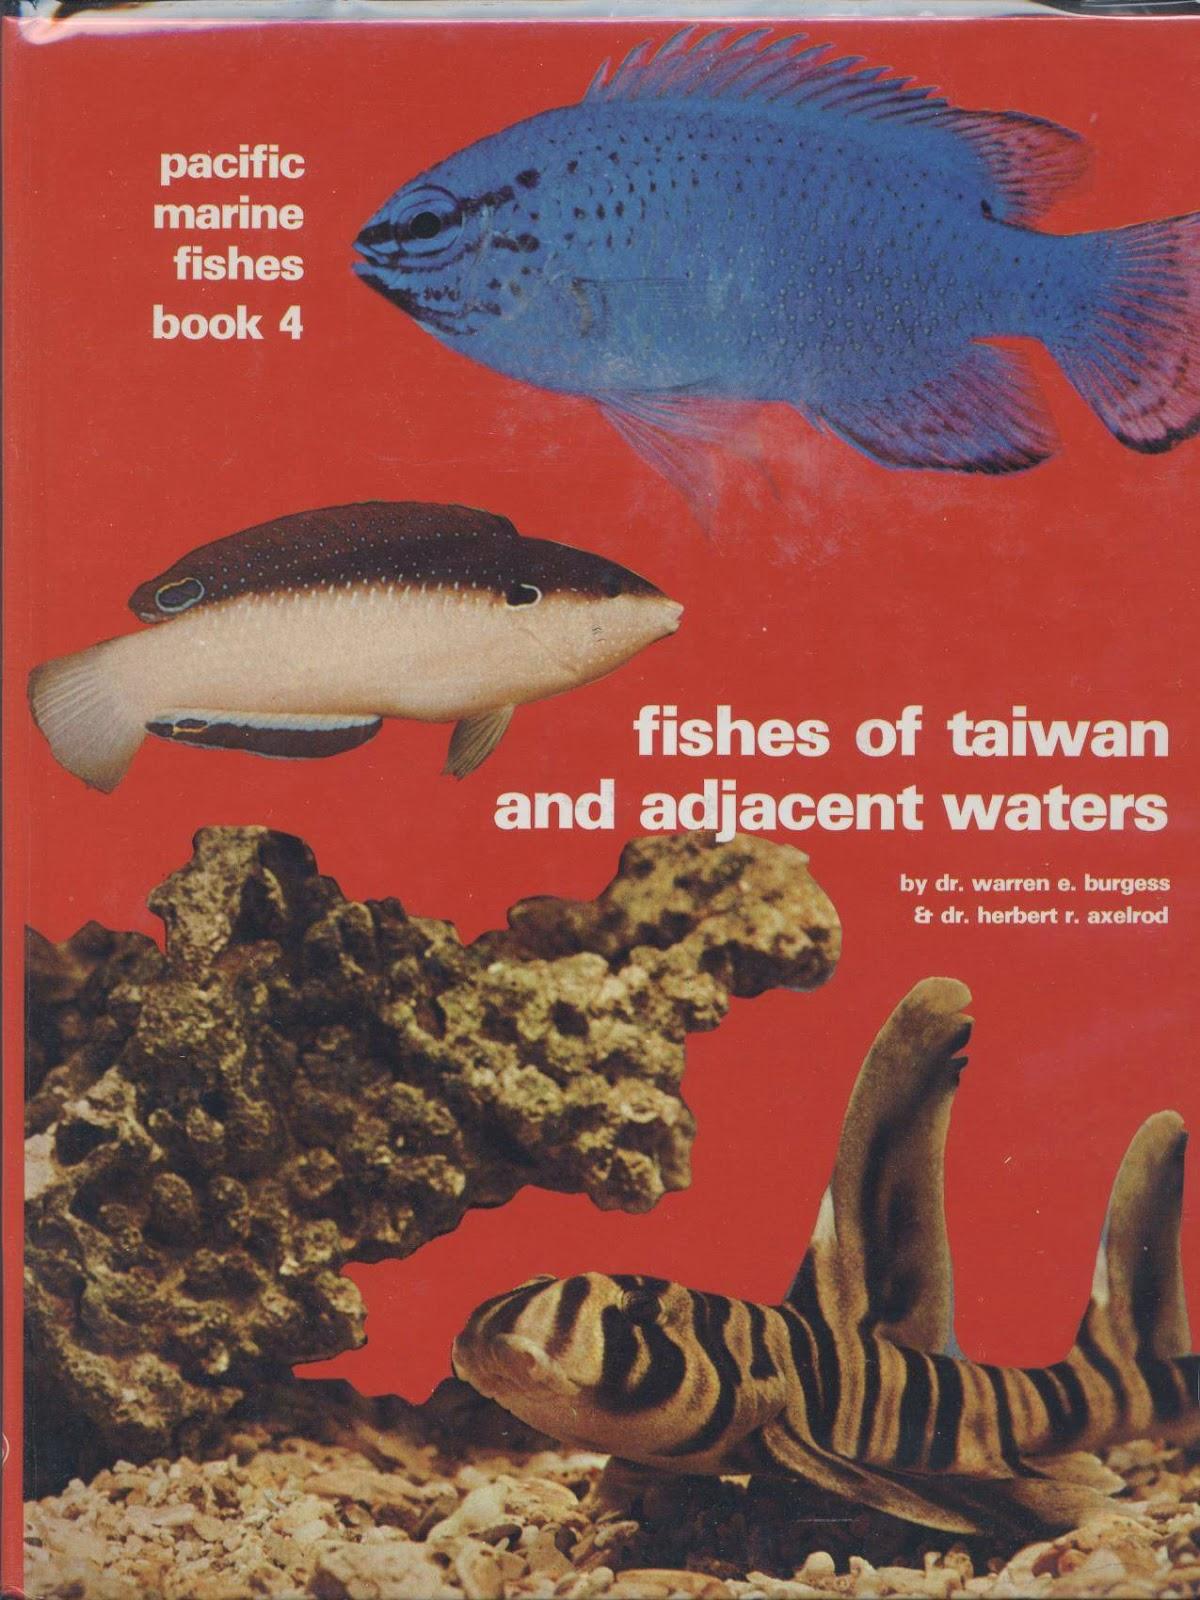 Ichthyology Books: Marine